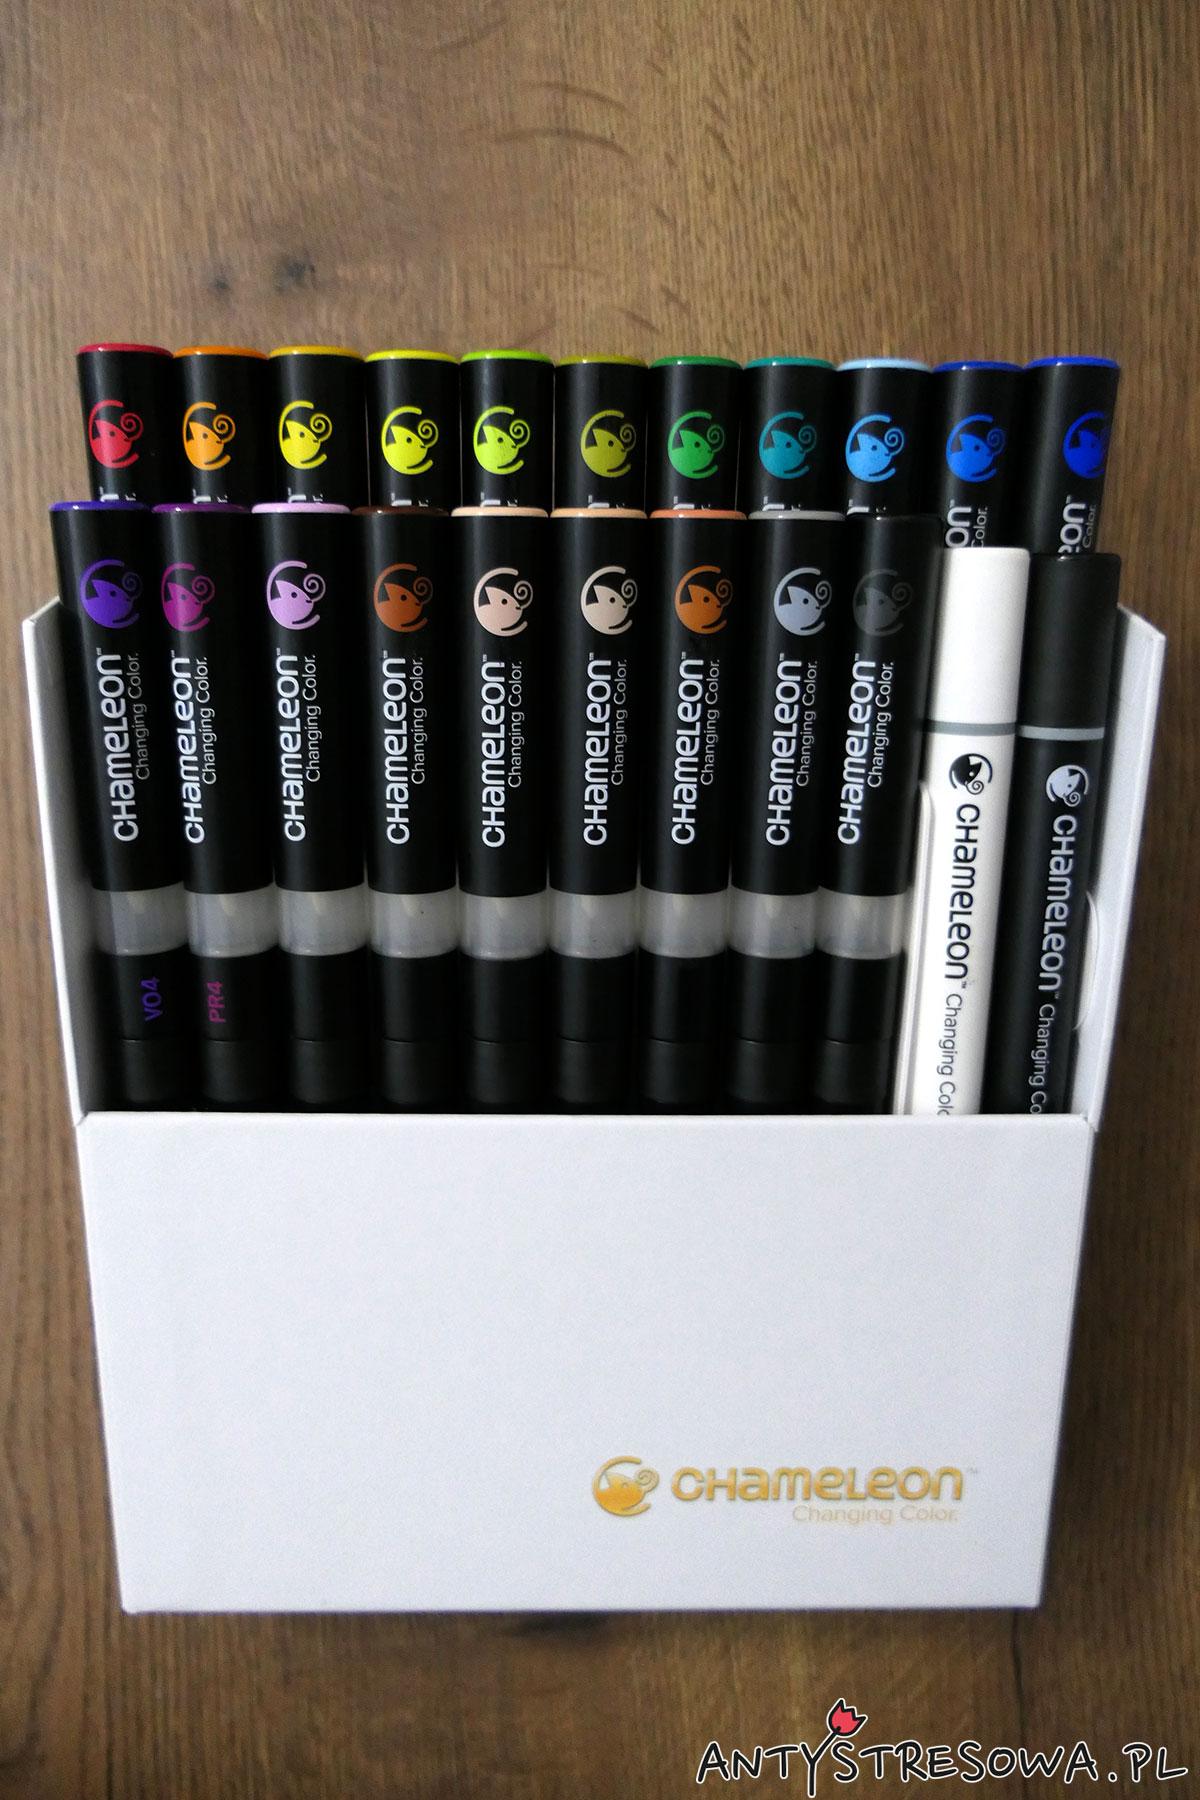 Chameleon Changing Color markery